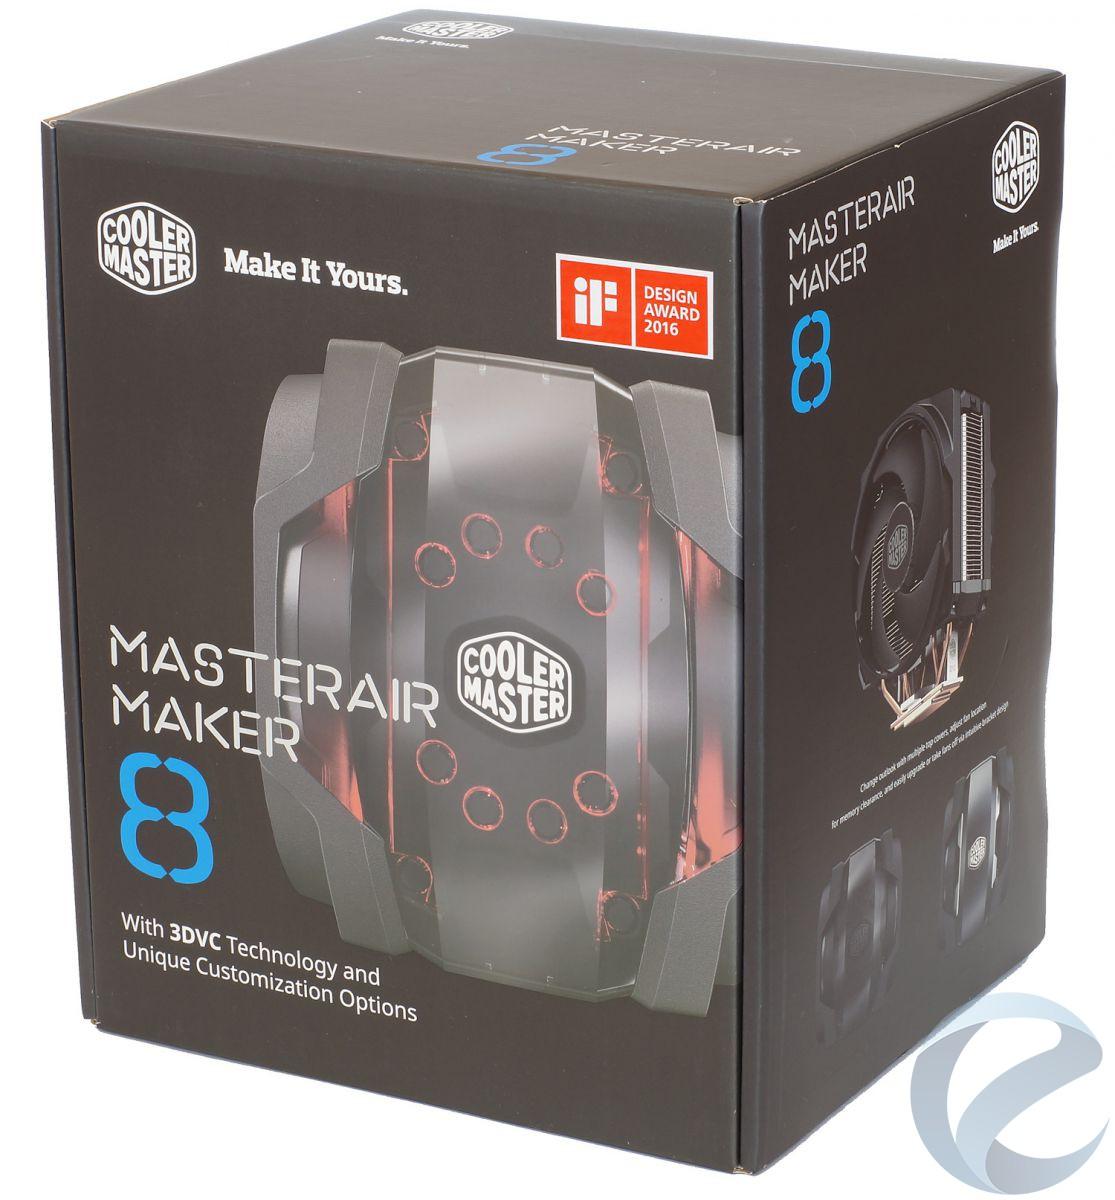 Упаковка и комплектация кулера Cooler Master MasterAir Maker 8